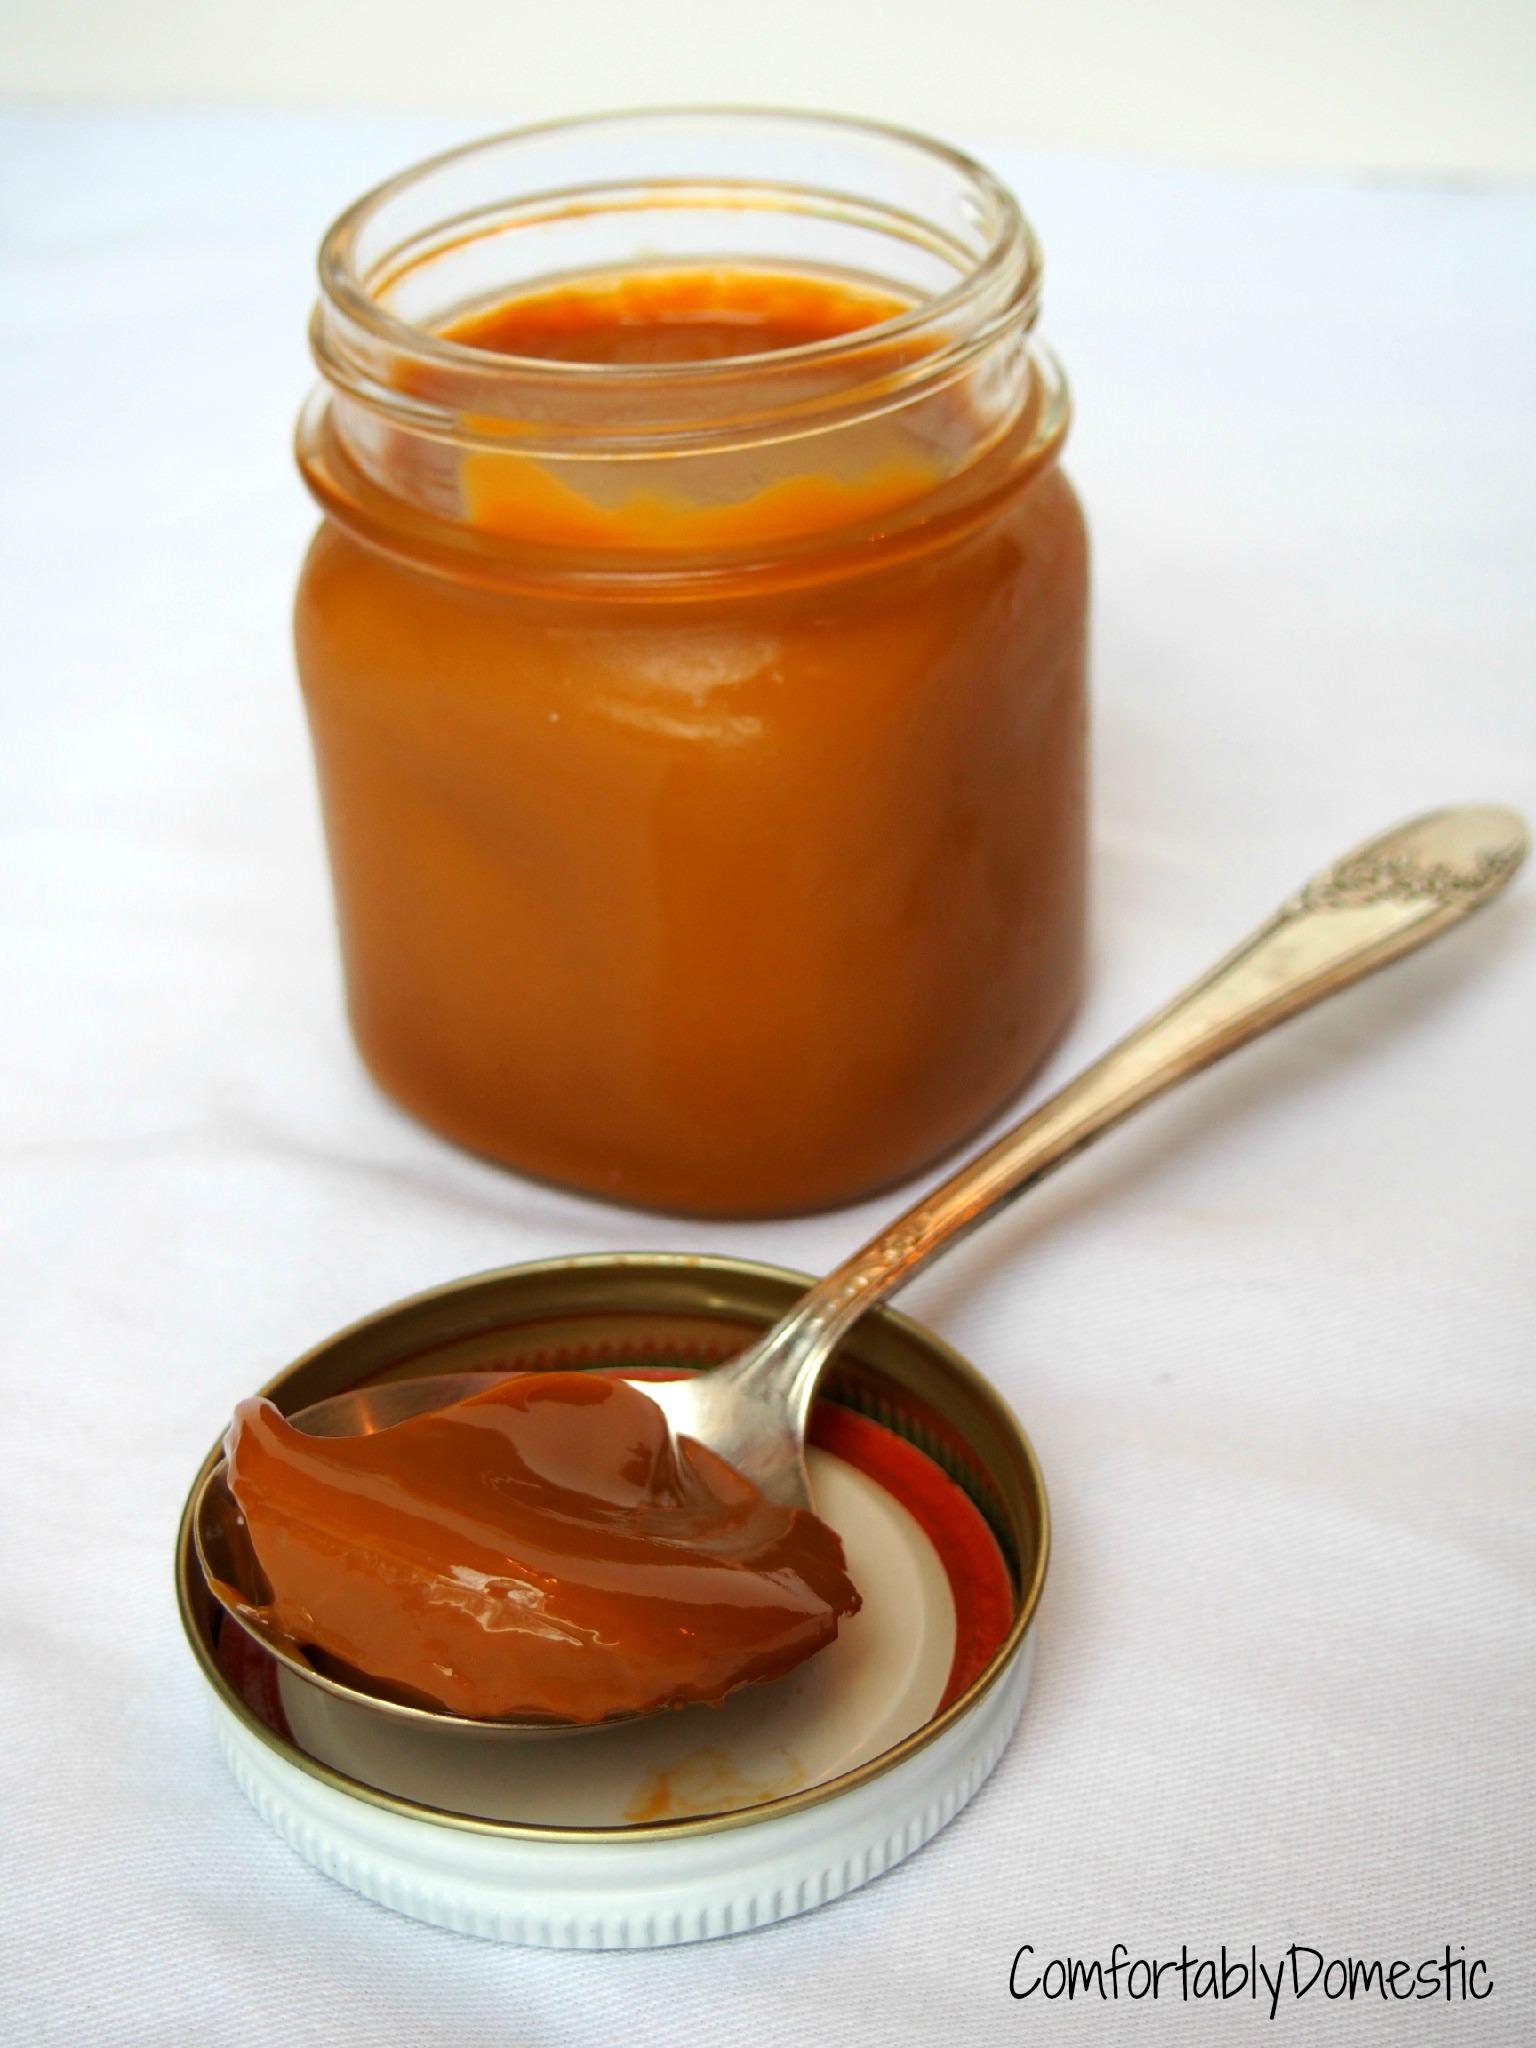 Dulce de Leche Caramel made in the crock pot from ComfortablyDomestic.com